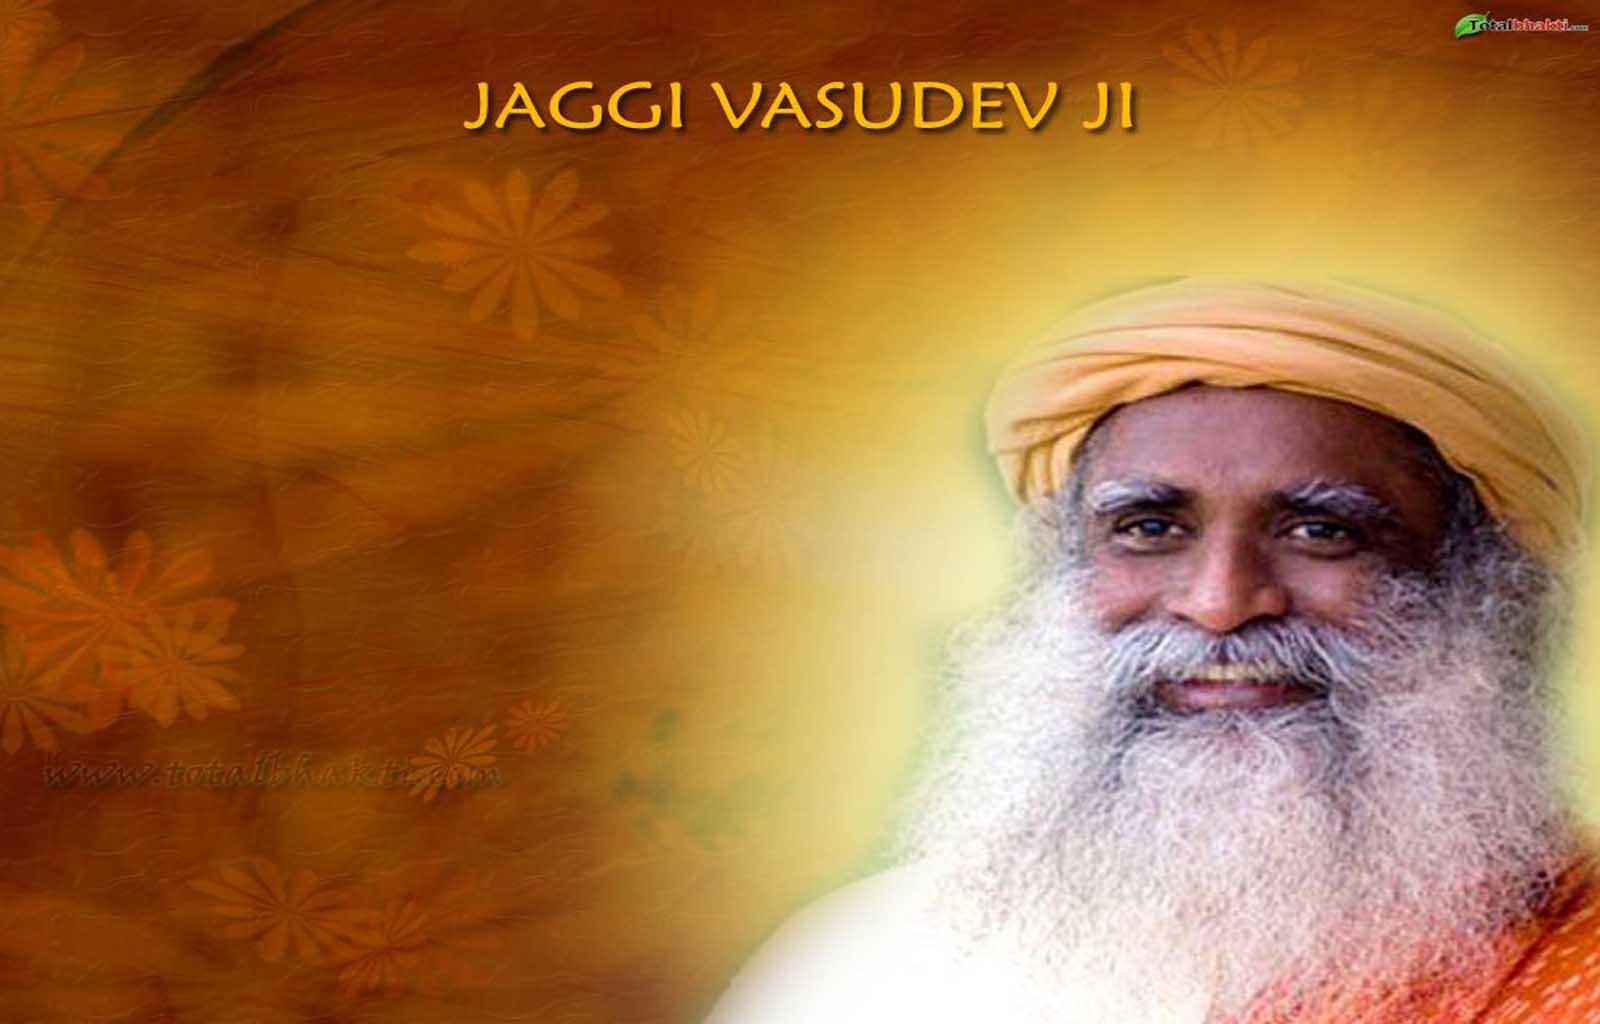 Jaggi Vasudev   A few good things Sadhguru